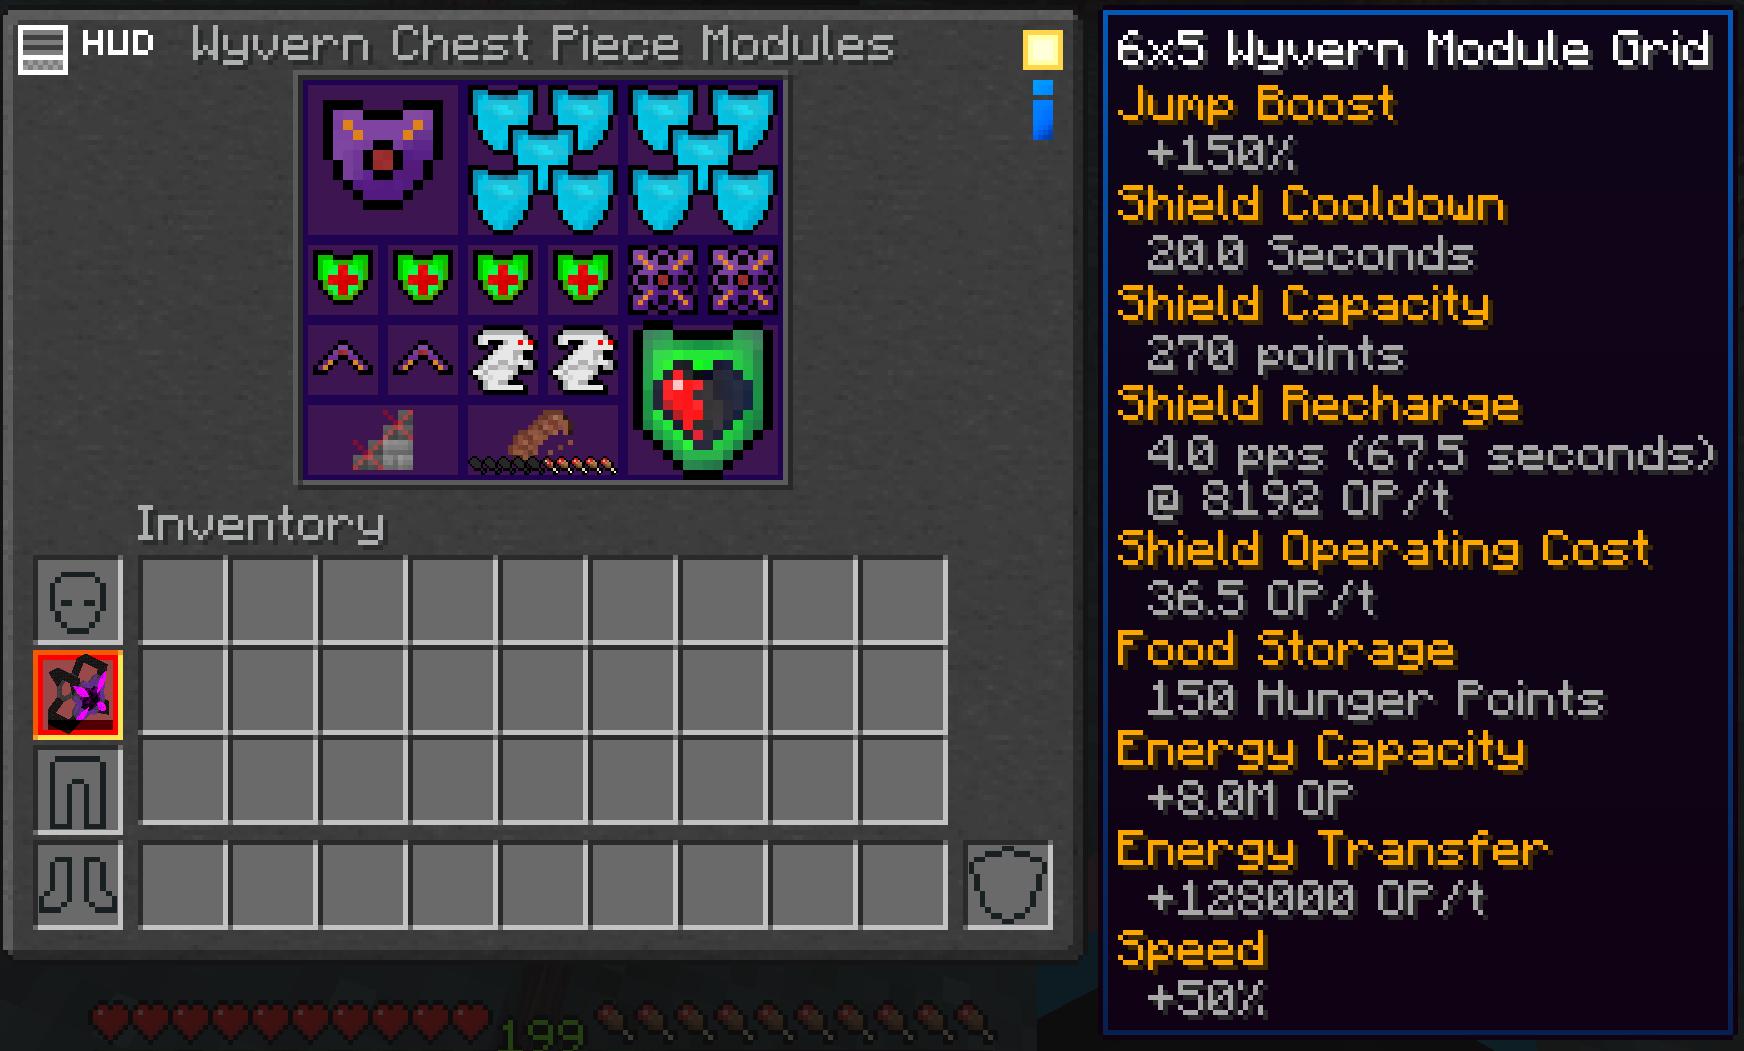 Module grid example